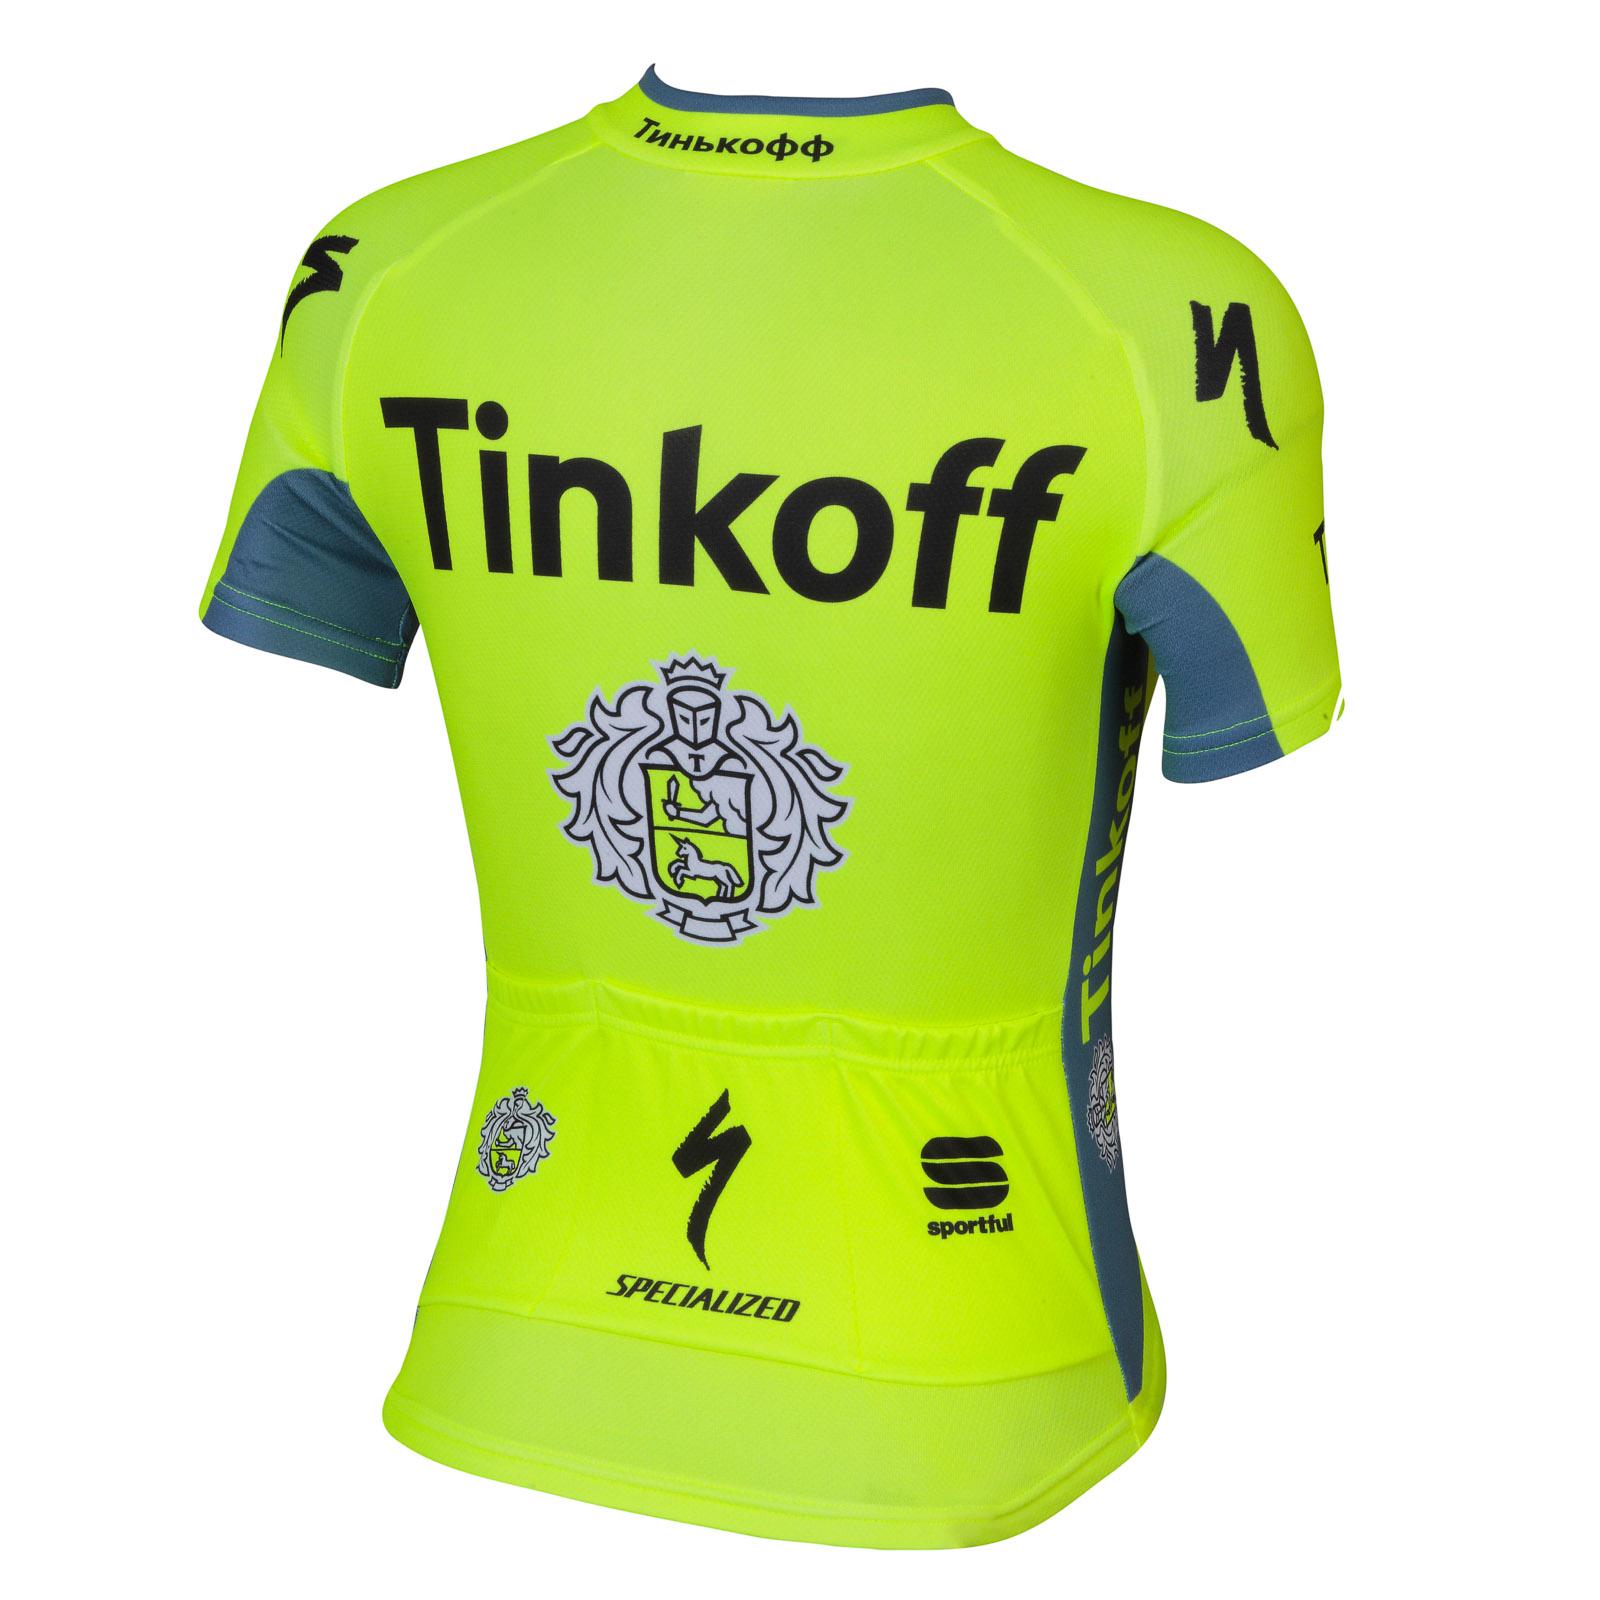 d1e3f006bae20 Sportful Tinkoff Detský Dres